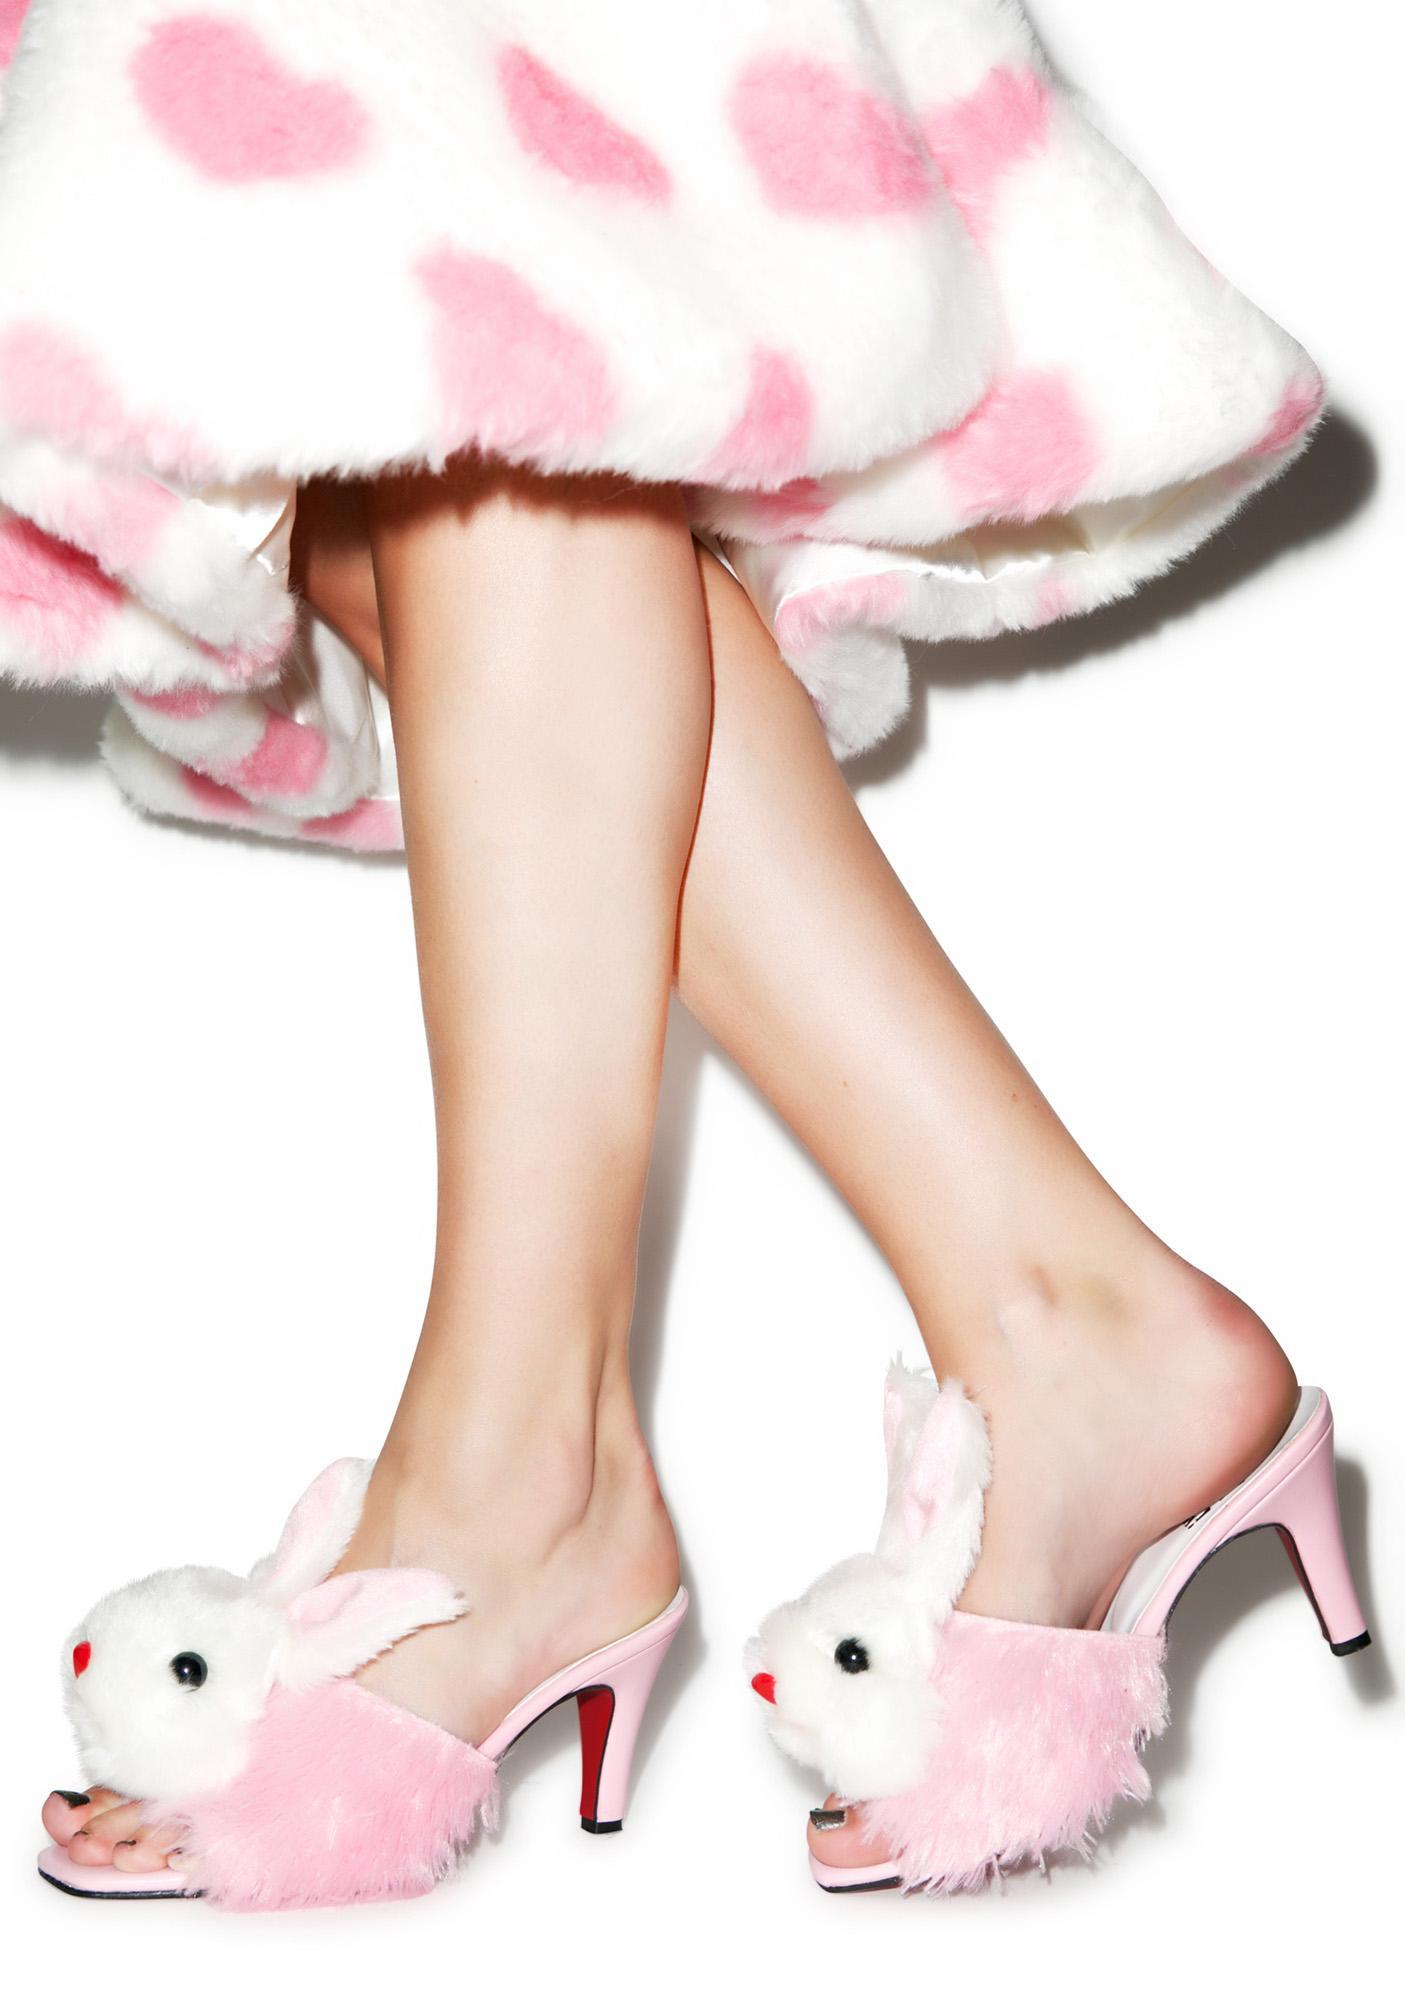 Slutty shoes